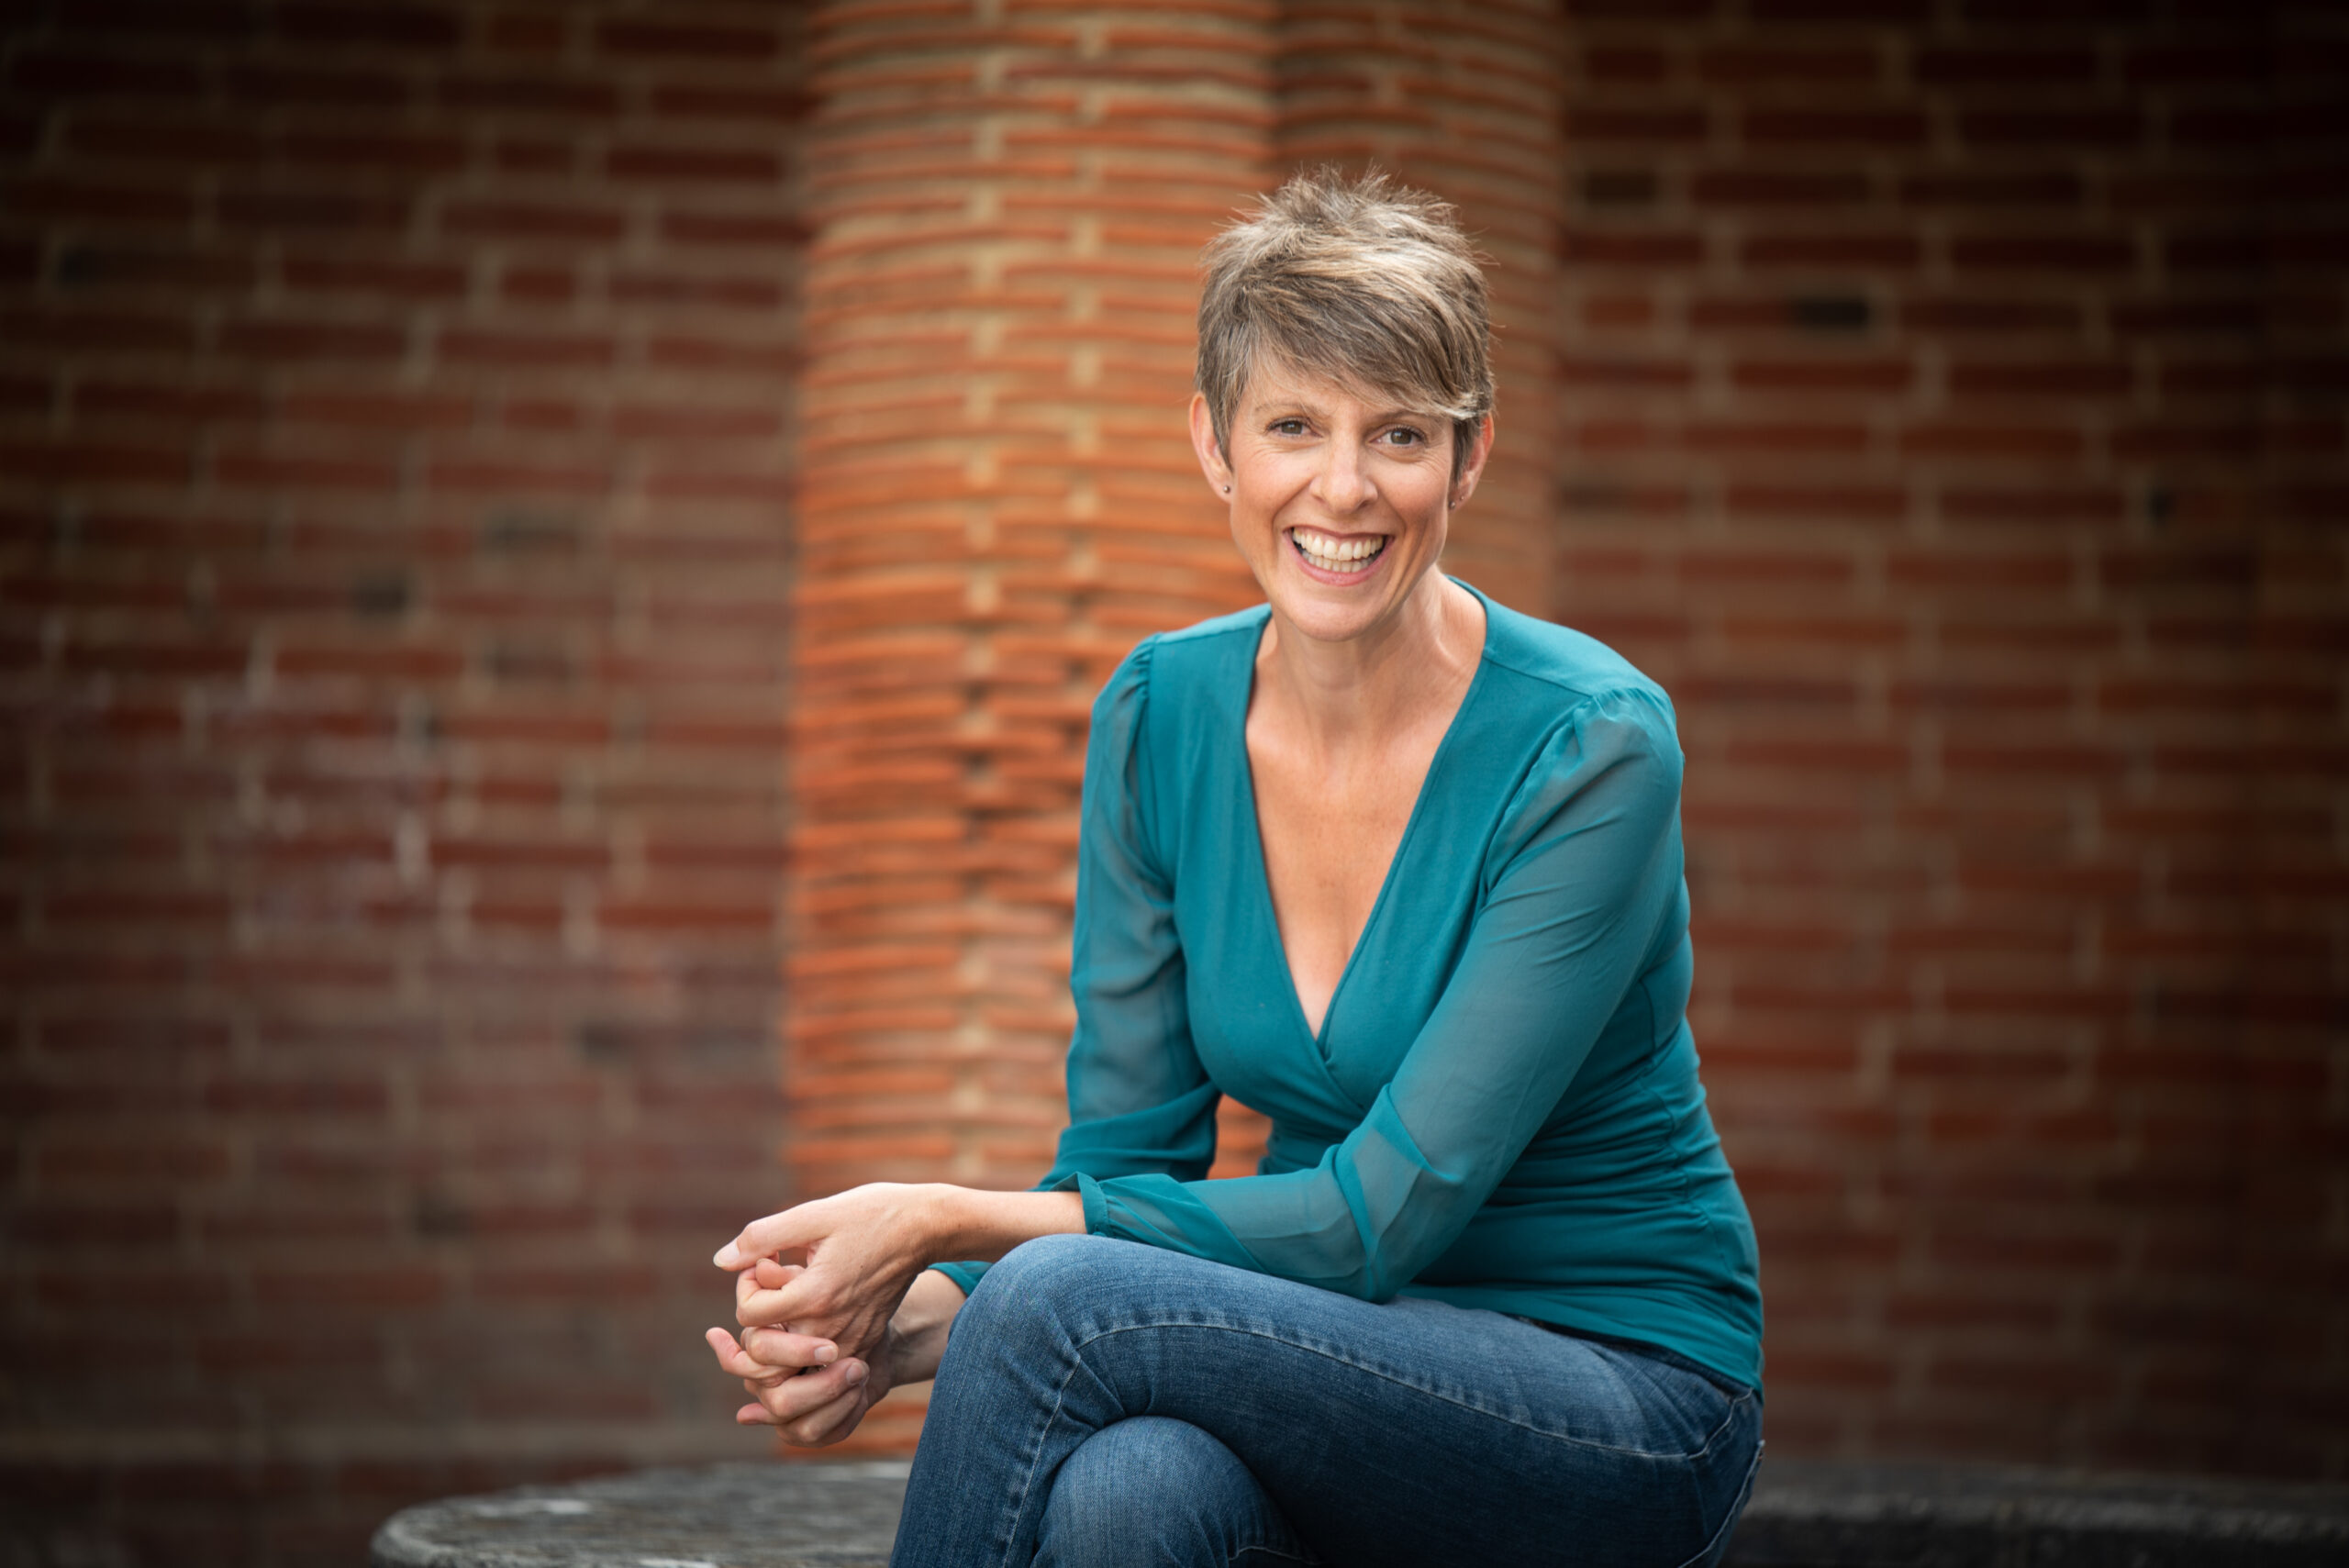 lady sitting with brick wall